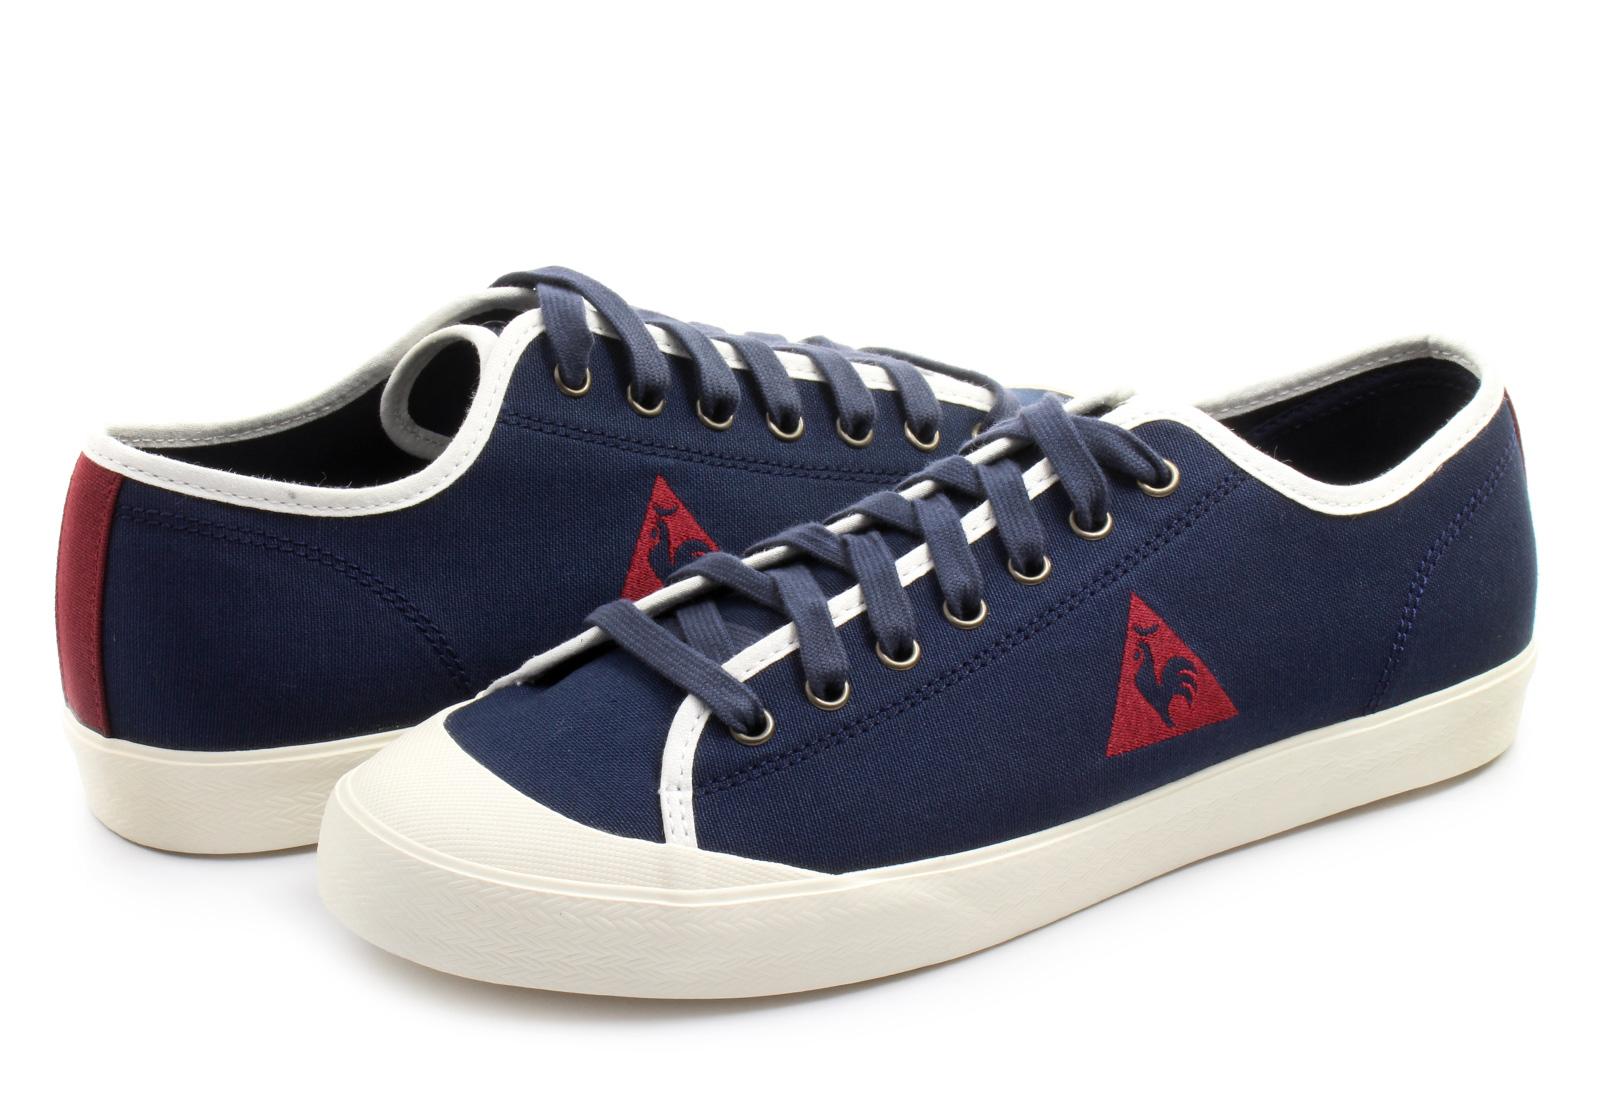 le coq sportif shoes estoril 1511283 online shop for sneakers shoes and boots. Black Bedroom Furniture Sets. Home Design Ideas